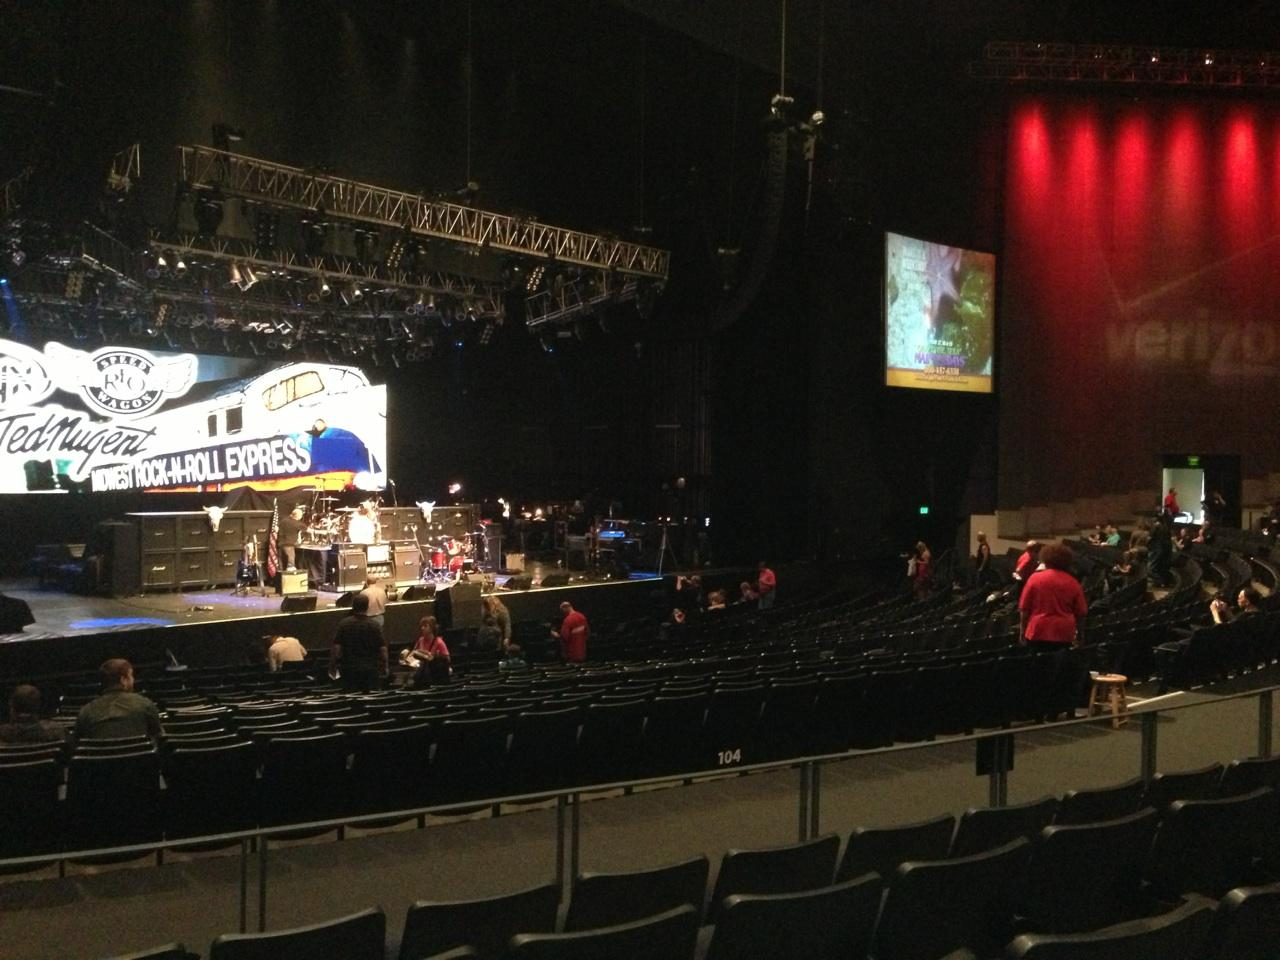 Verizon Theatre Section 205 - RateYourSeats.com